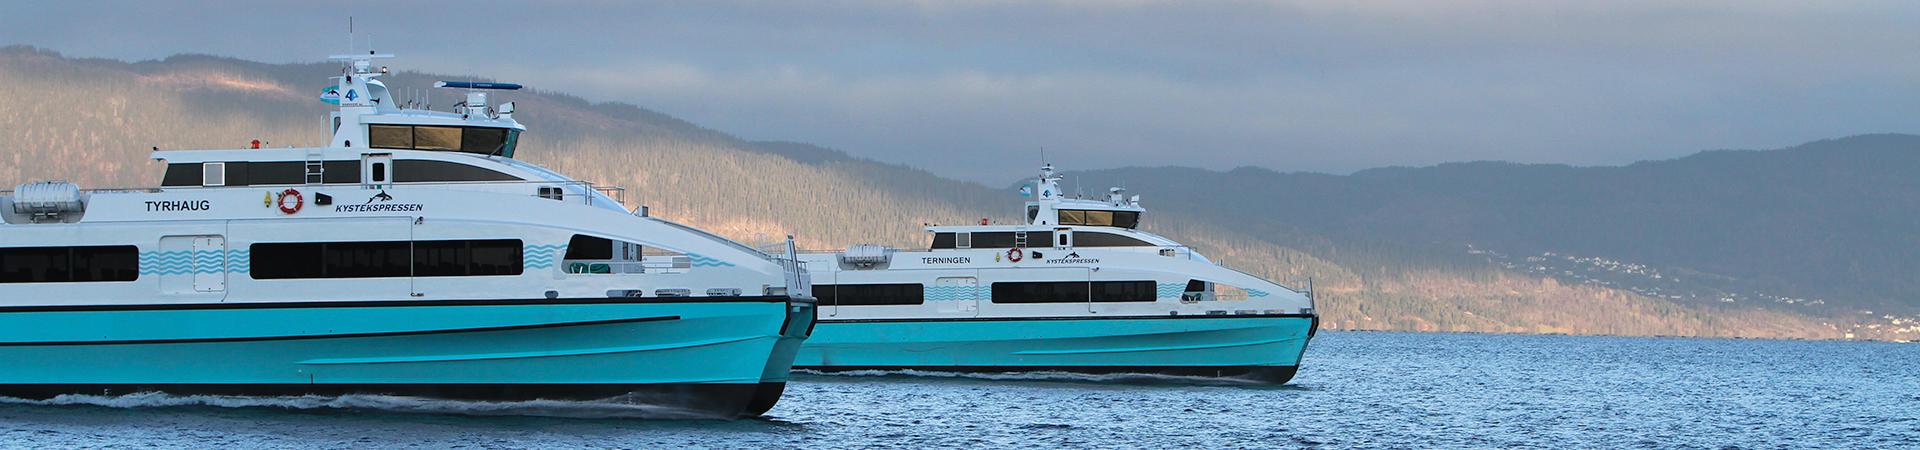 Verdens mest miljøvennlige hurtigbåter